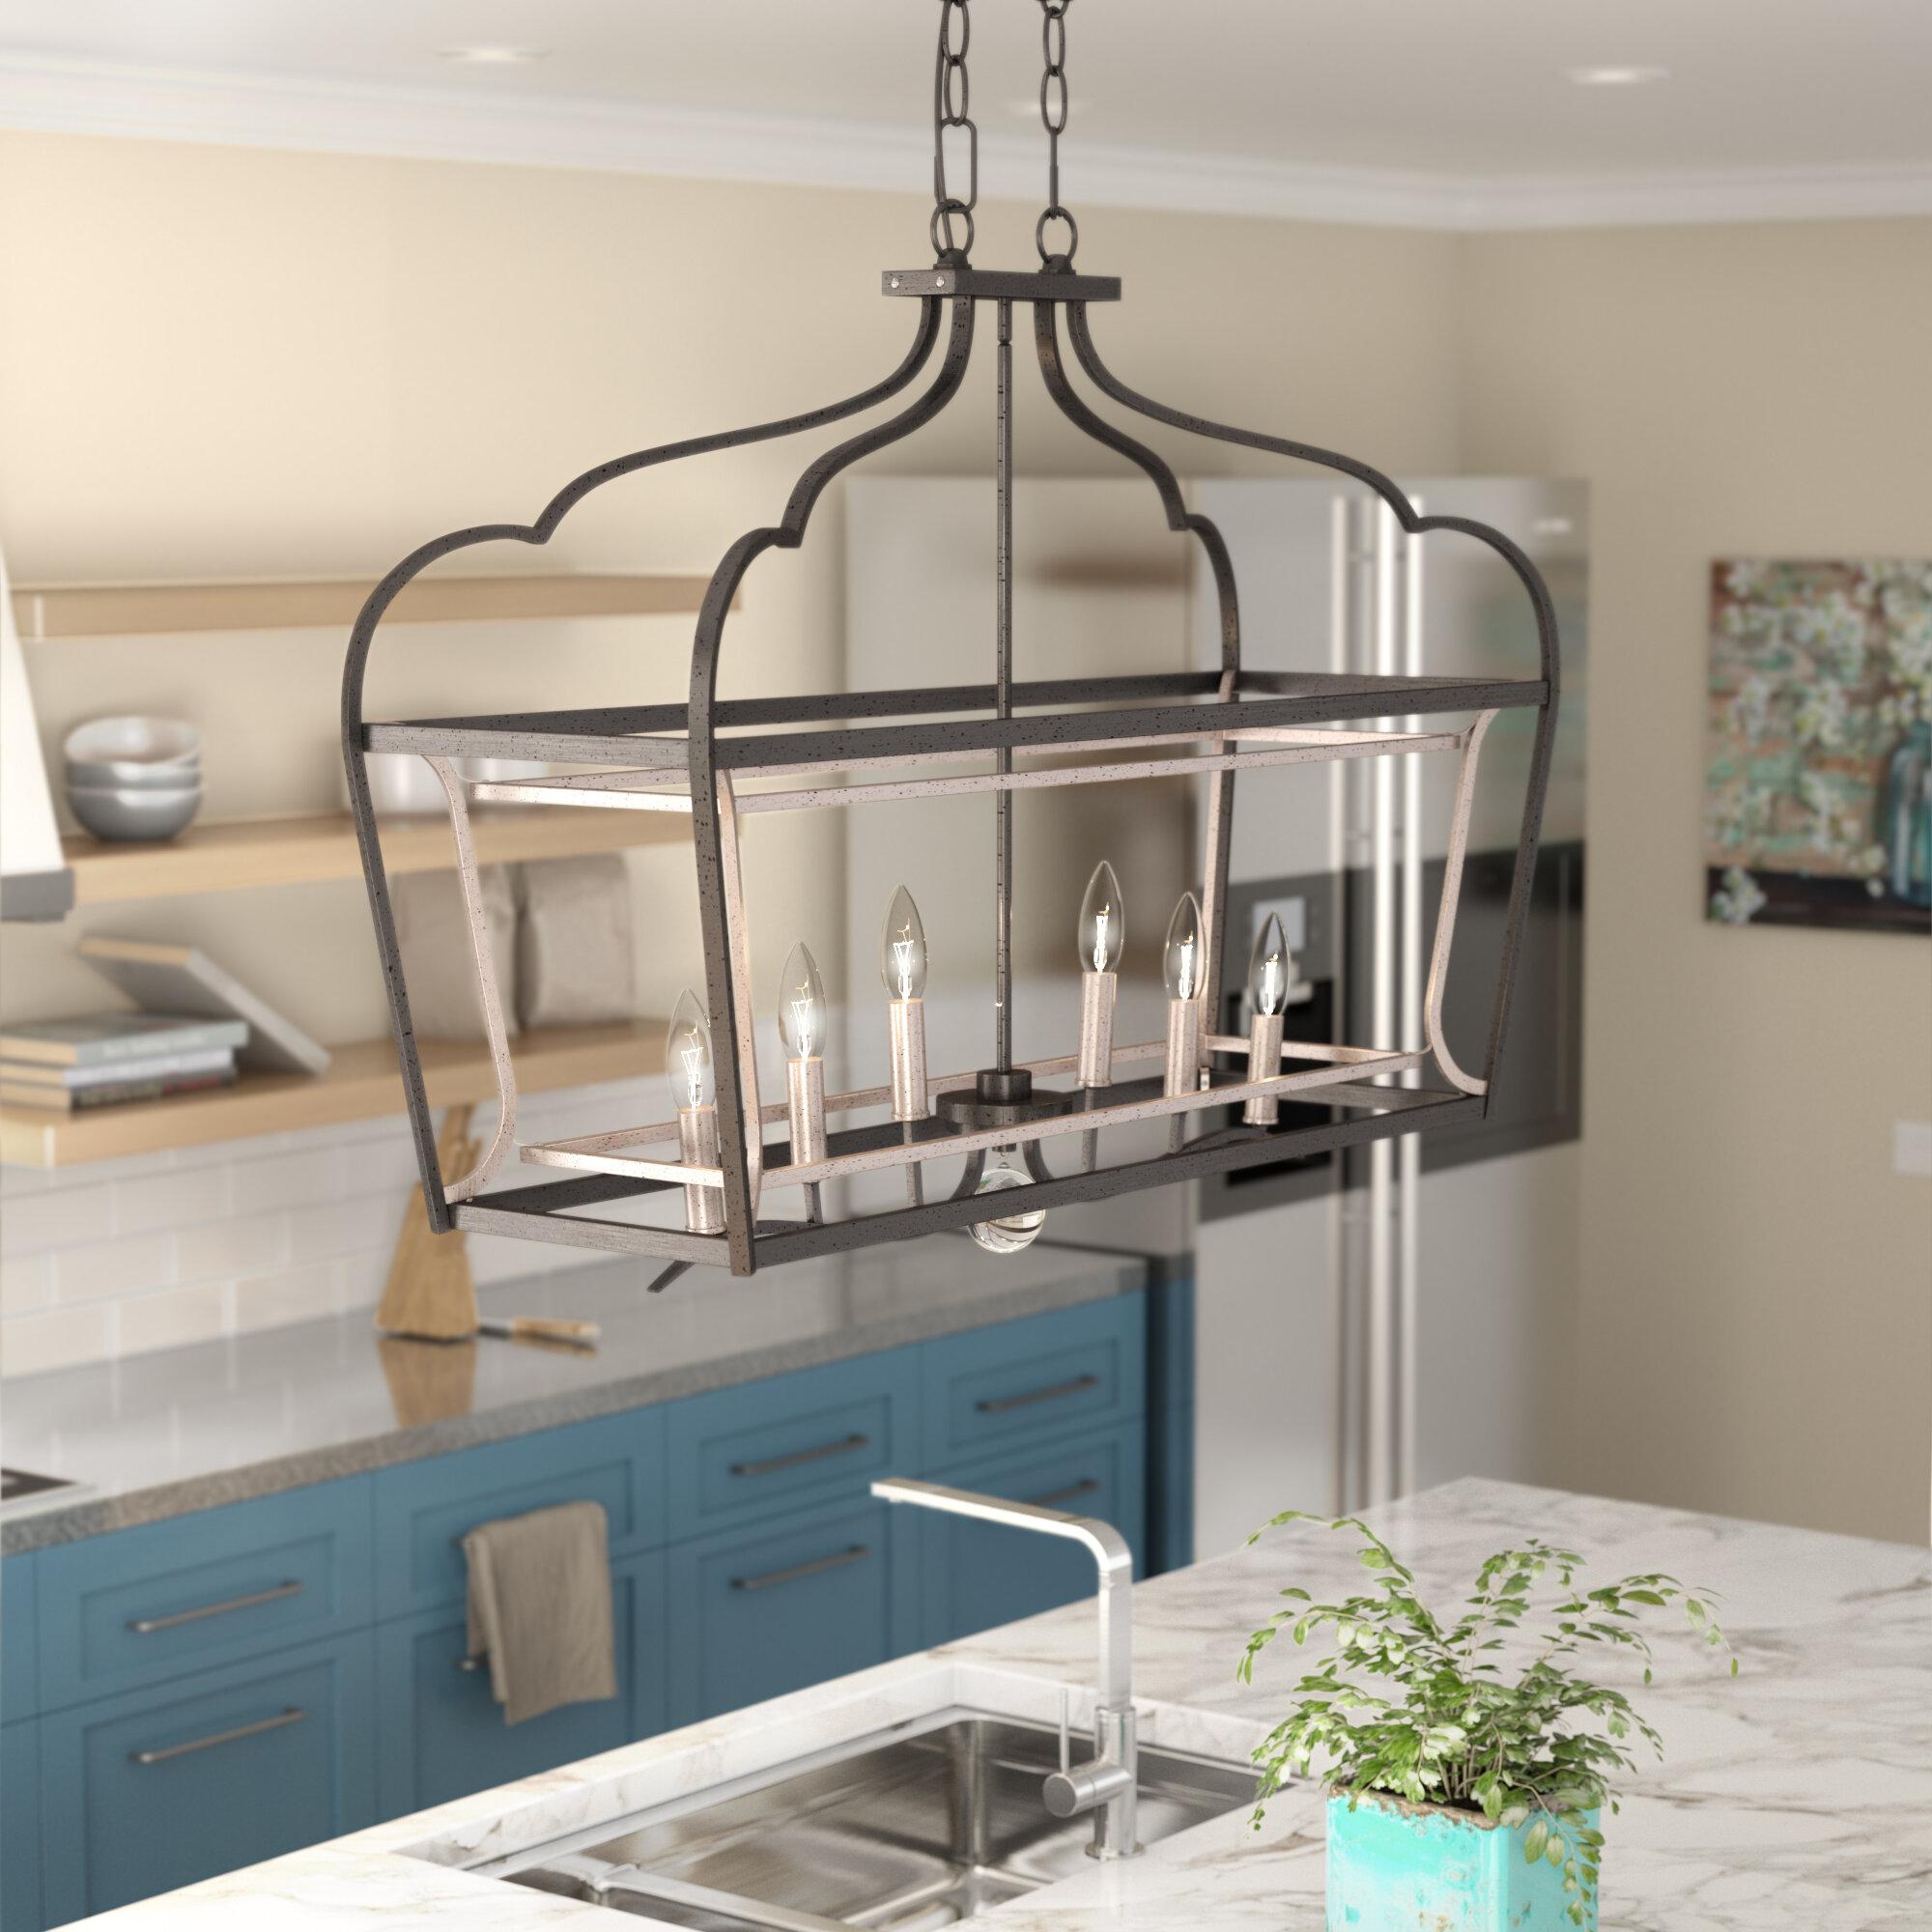 Evangeline 6-Light Kitchen Island Pendant